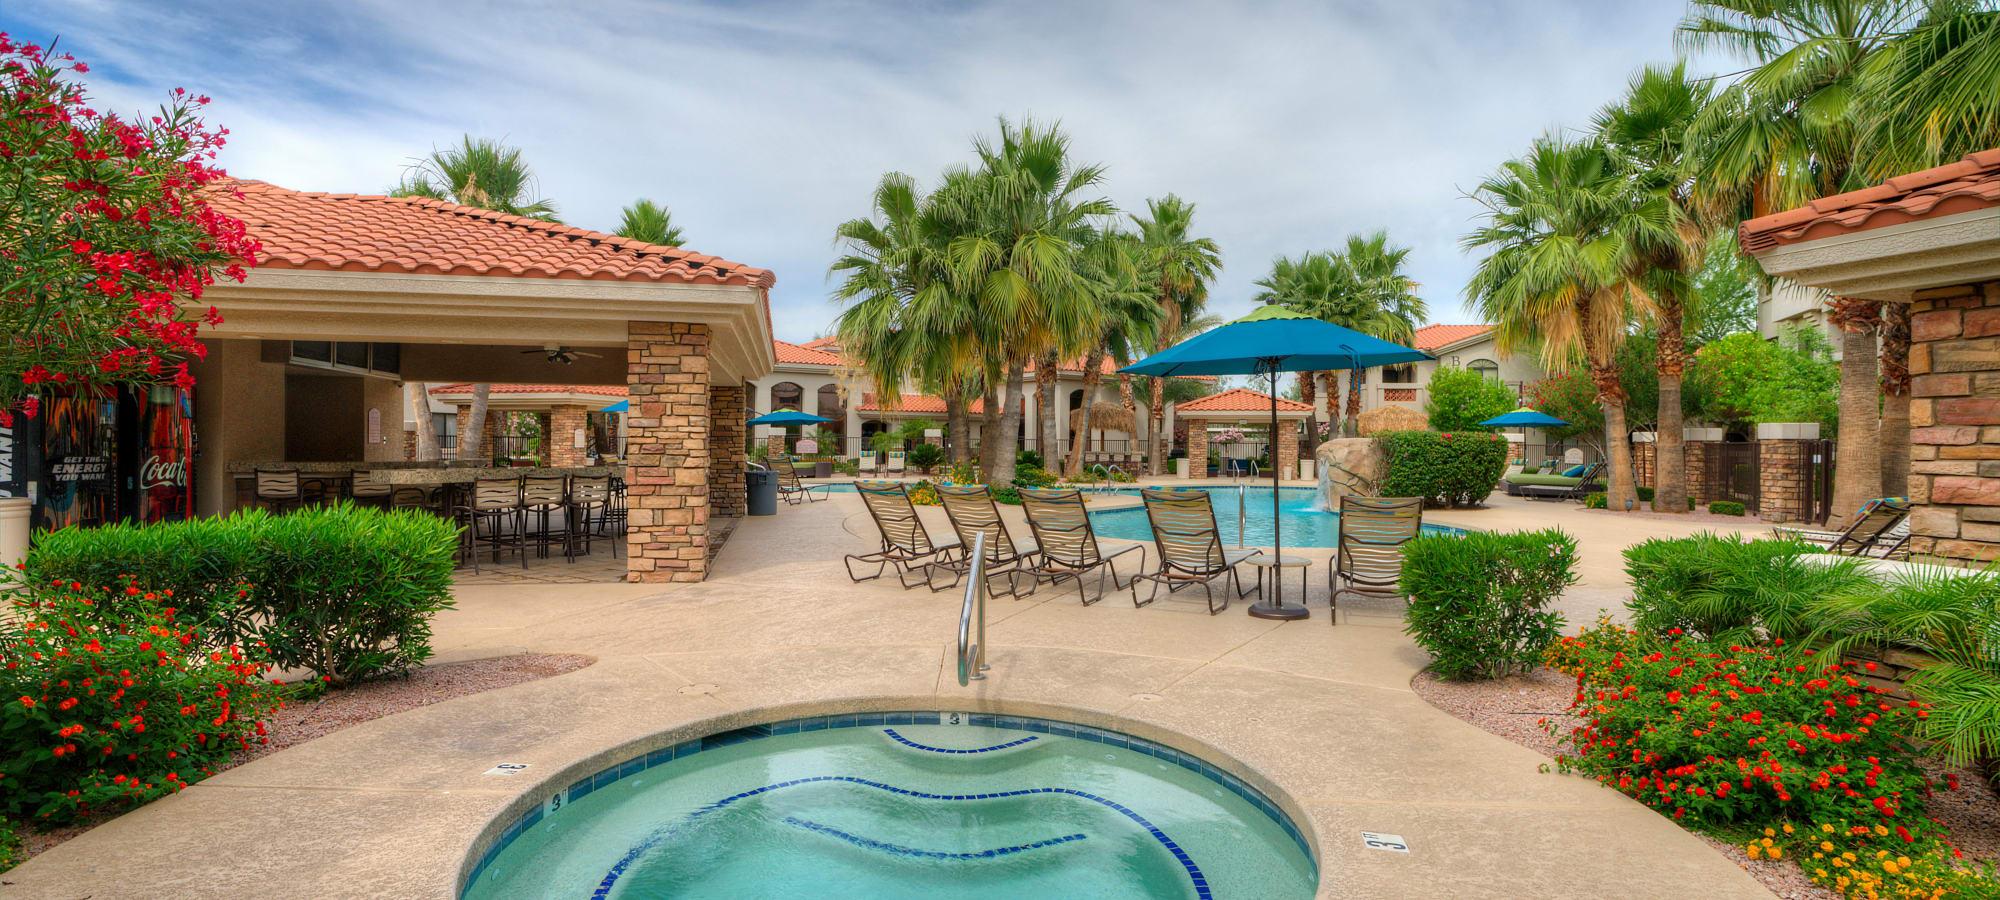 Resort-style hot tub at San Hacienda in Chandler, Arizona